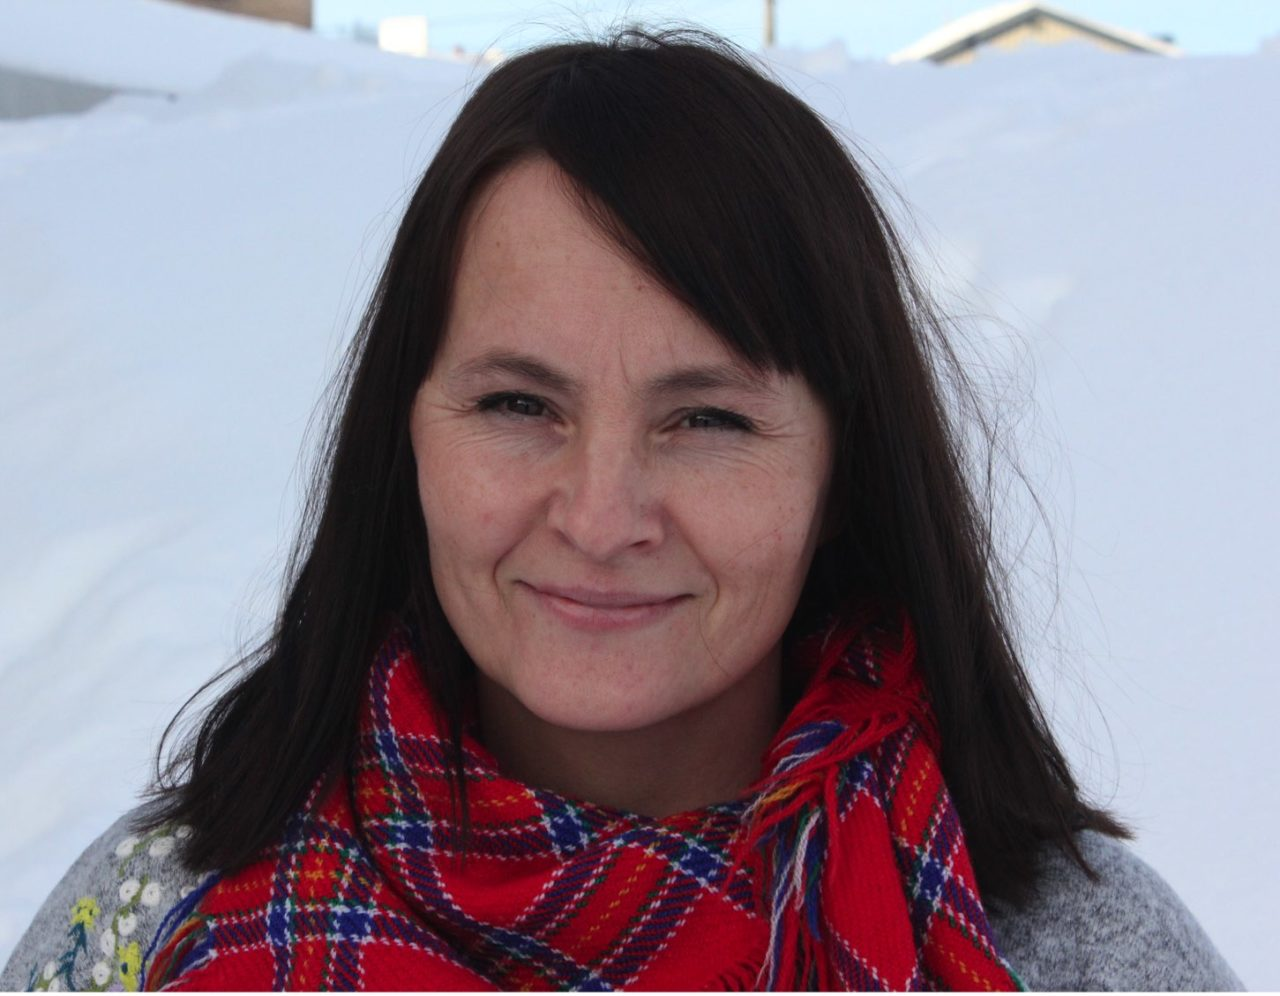 Anne-Lajla-Utsi-1-1280x996.jpg